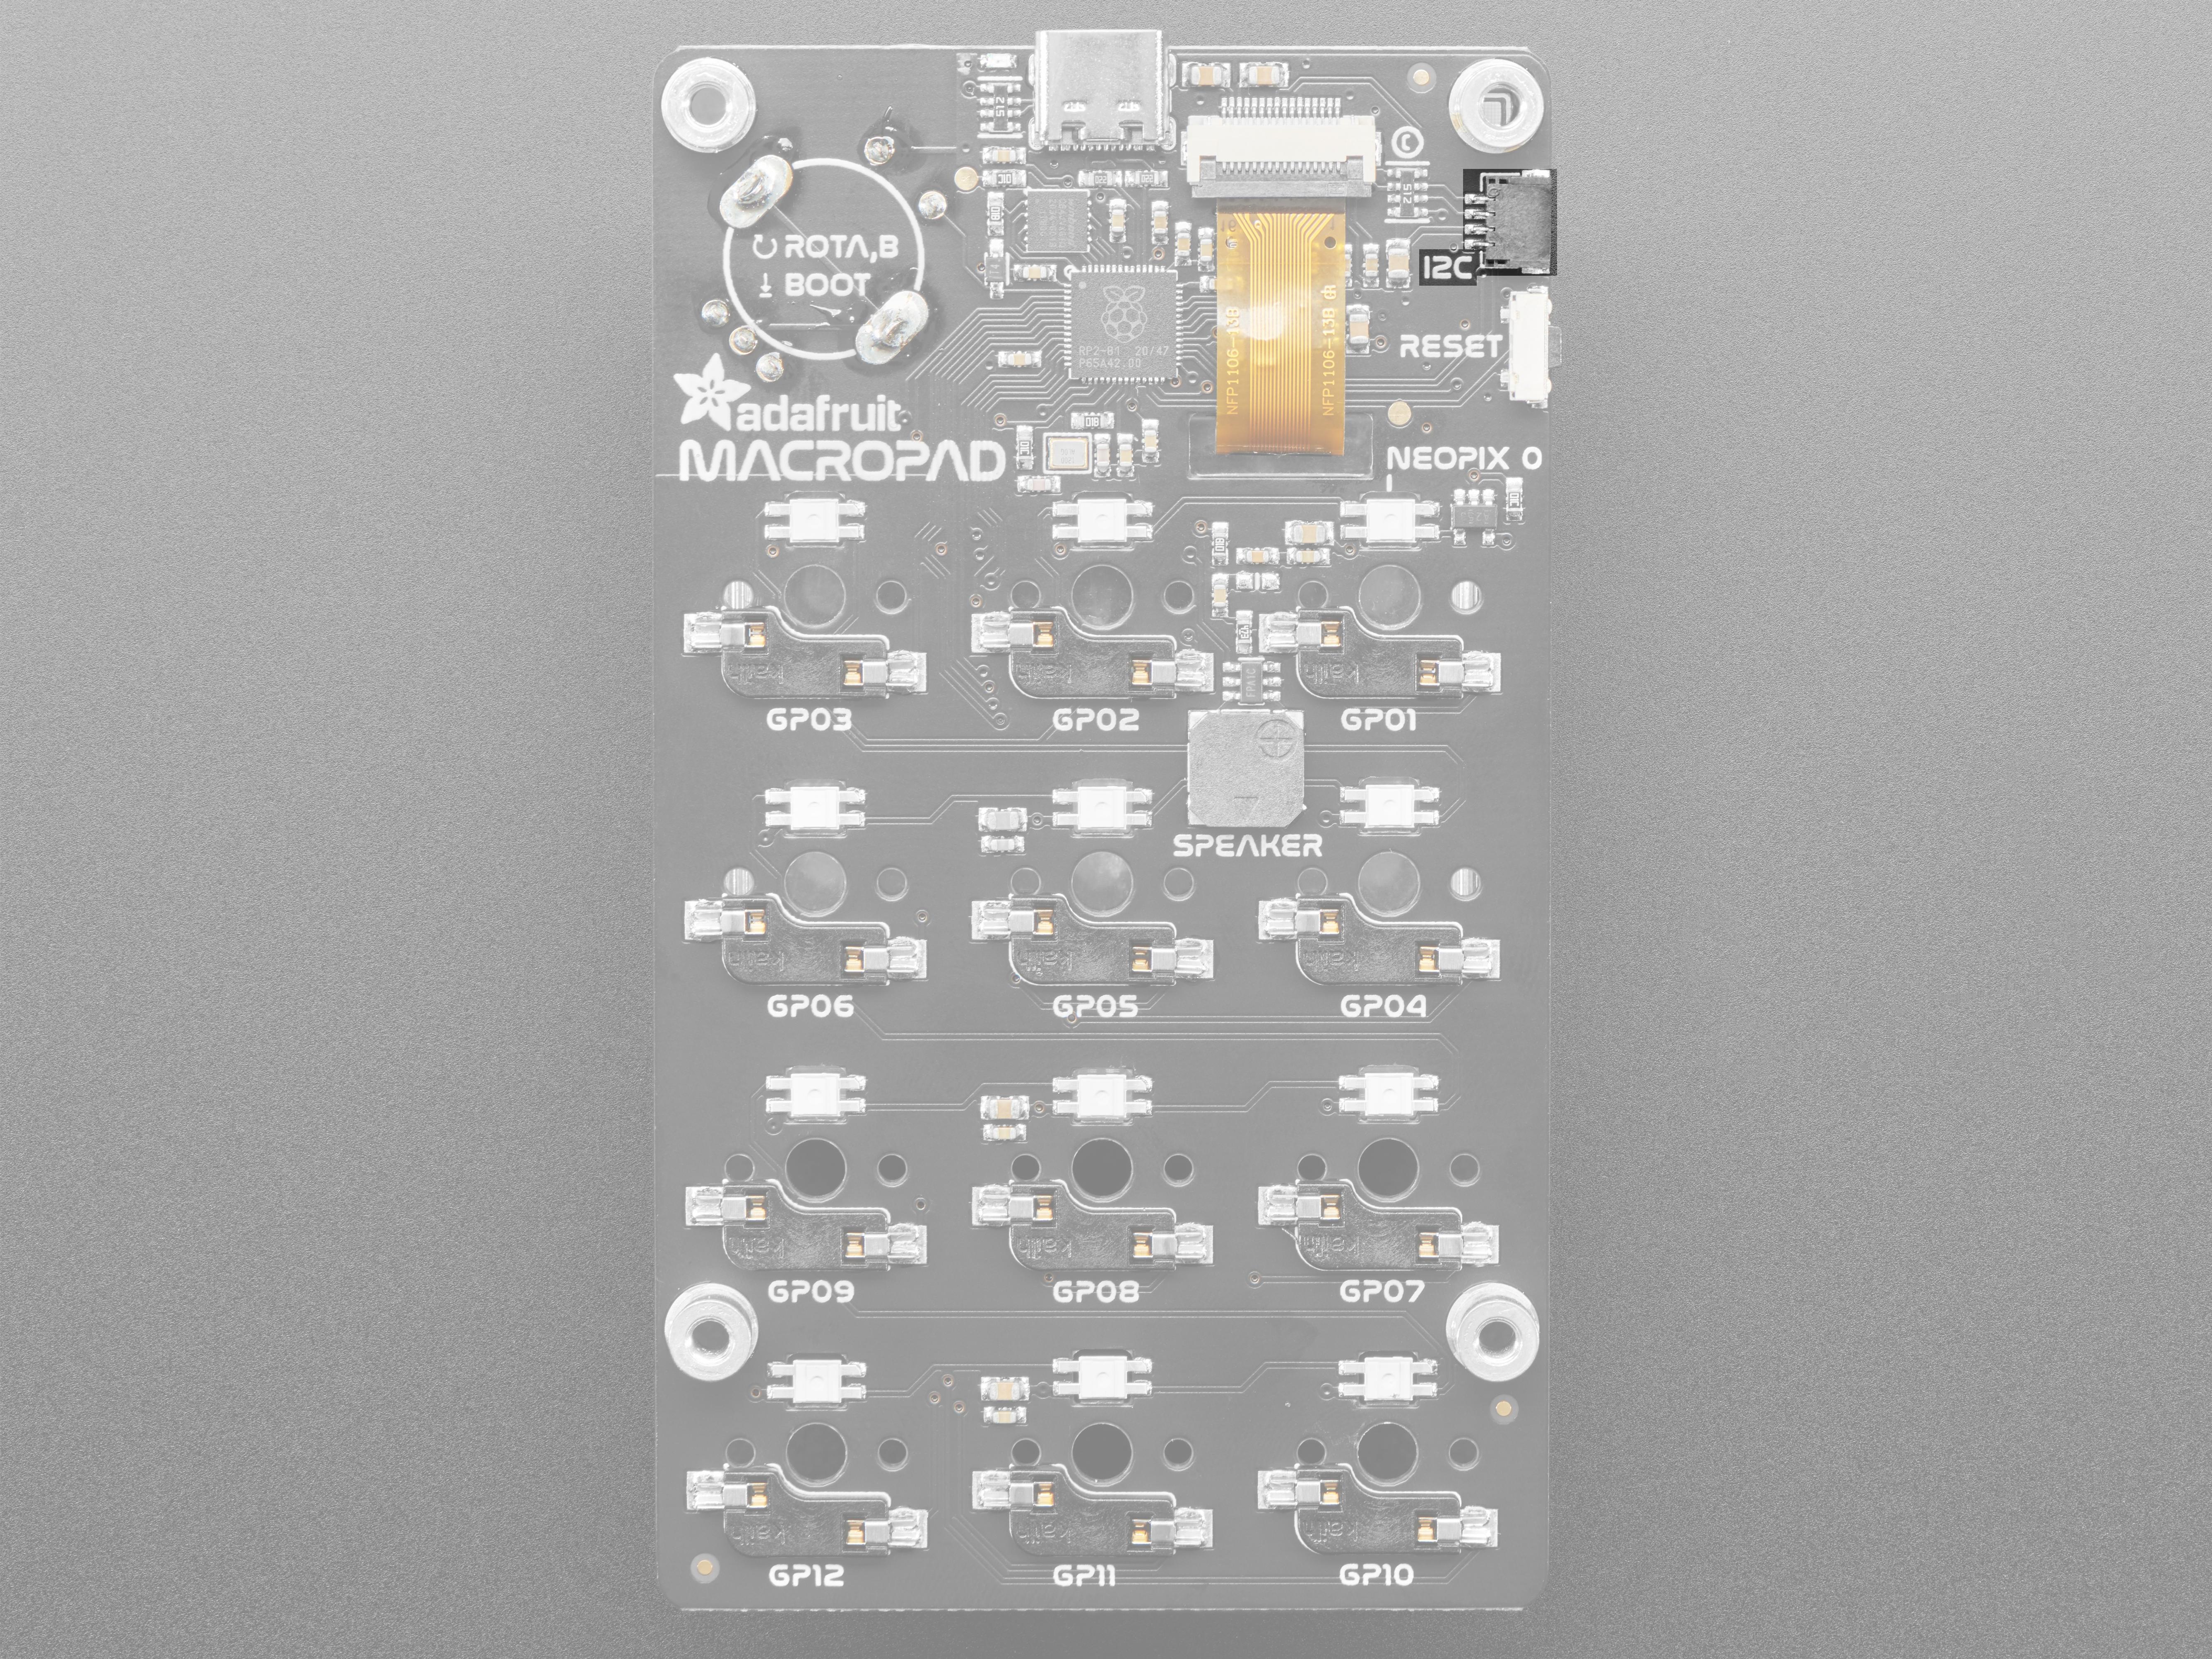 adafruit_products_MacroPad_pinouts_STEMMA_QT.jpg